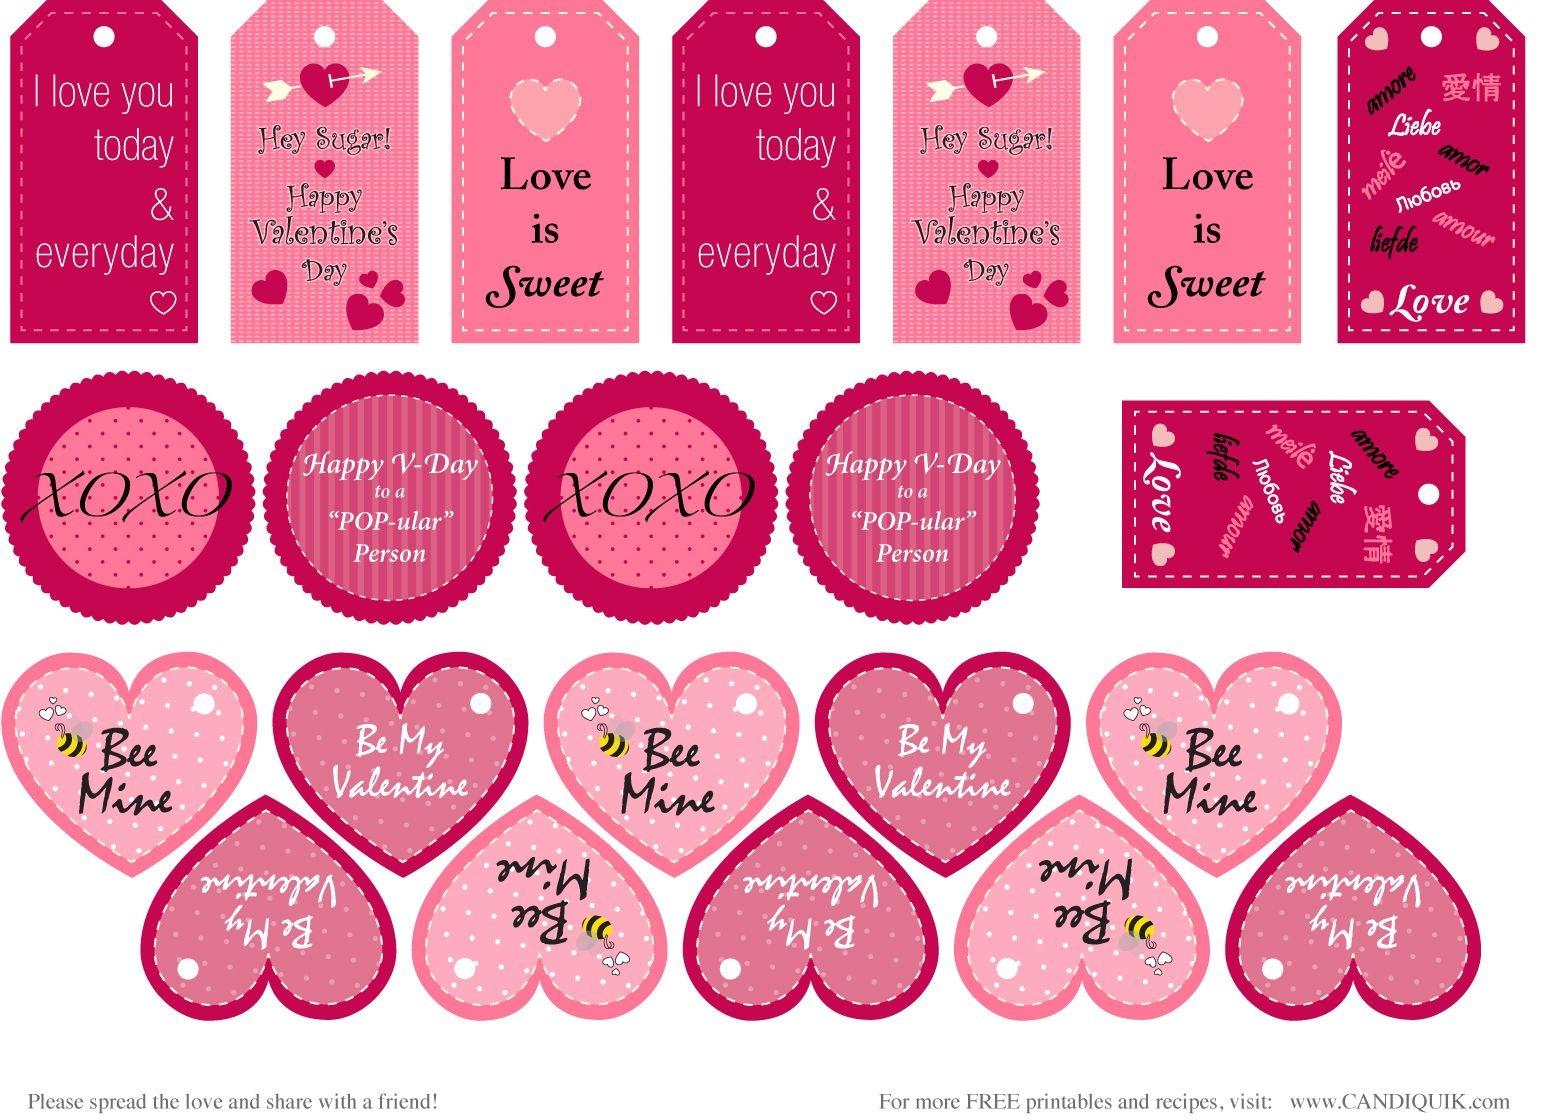 Free} Printables | Valentines | Valentine's Day Printables - Free Printable Valentines Day Tags